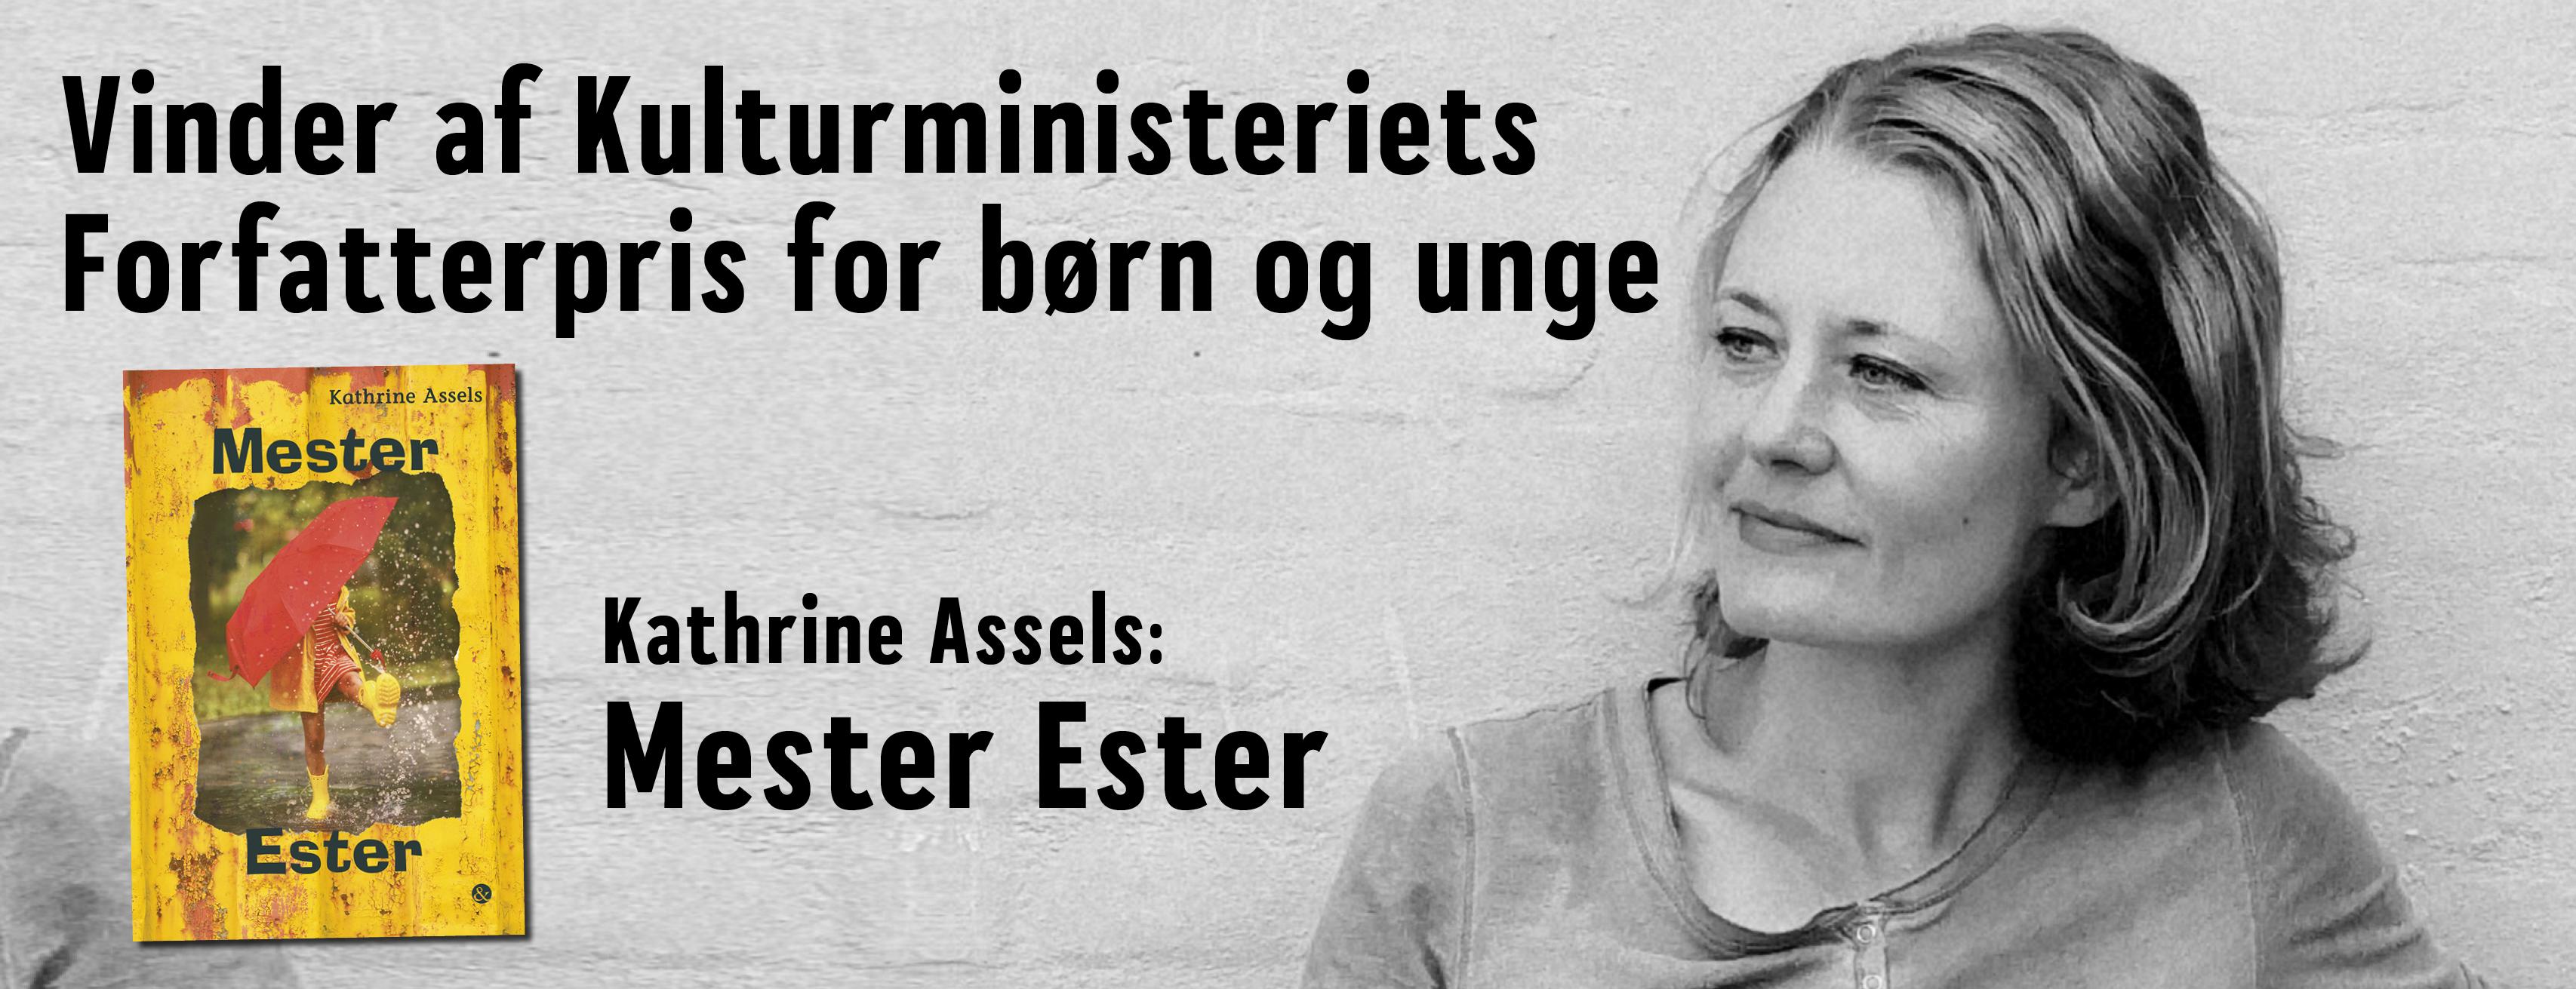 Kathrine Assels: Mester Ester